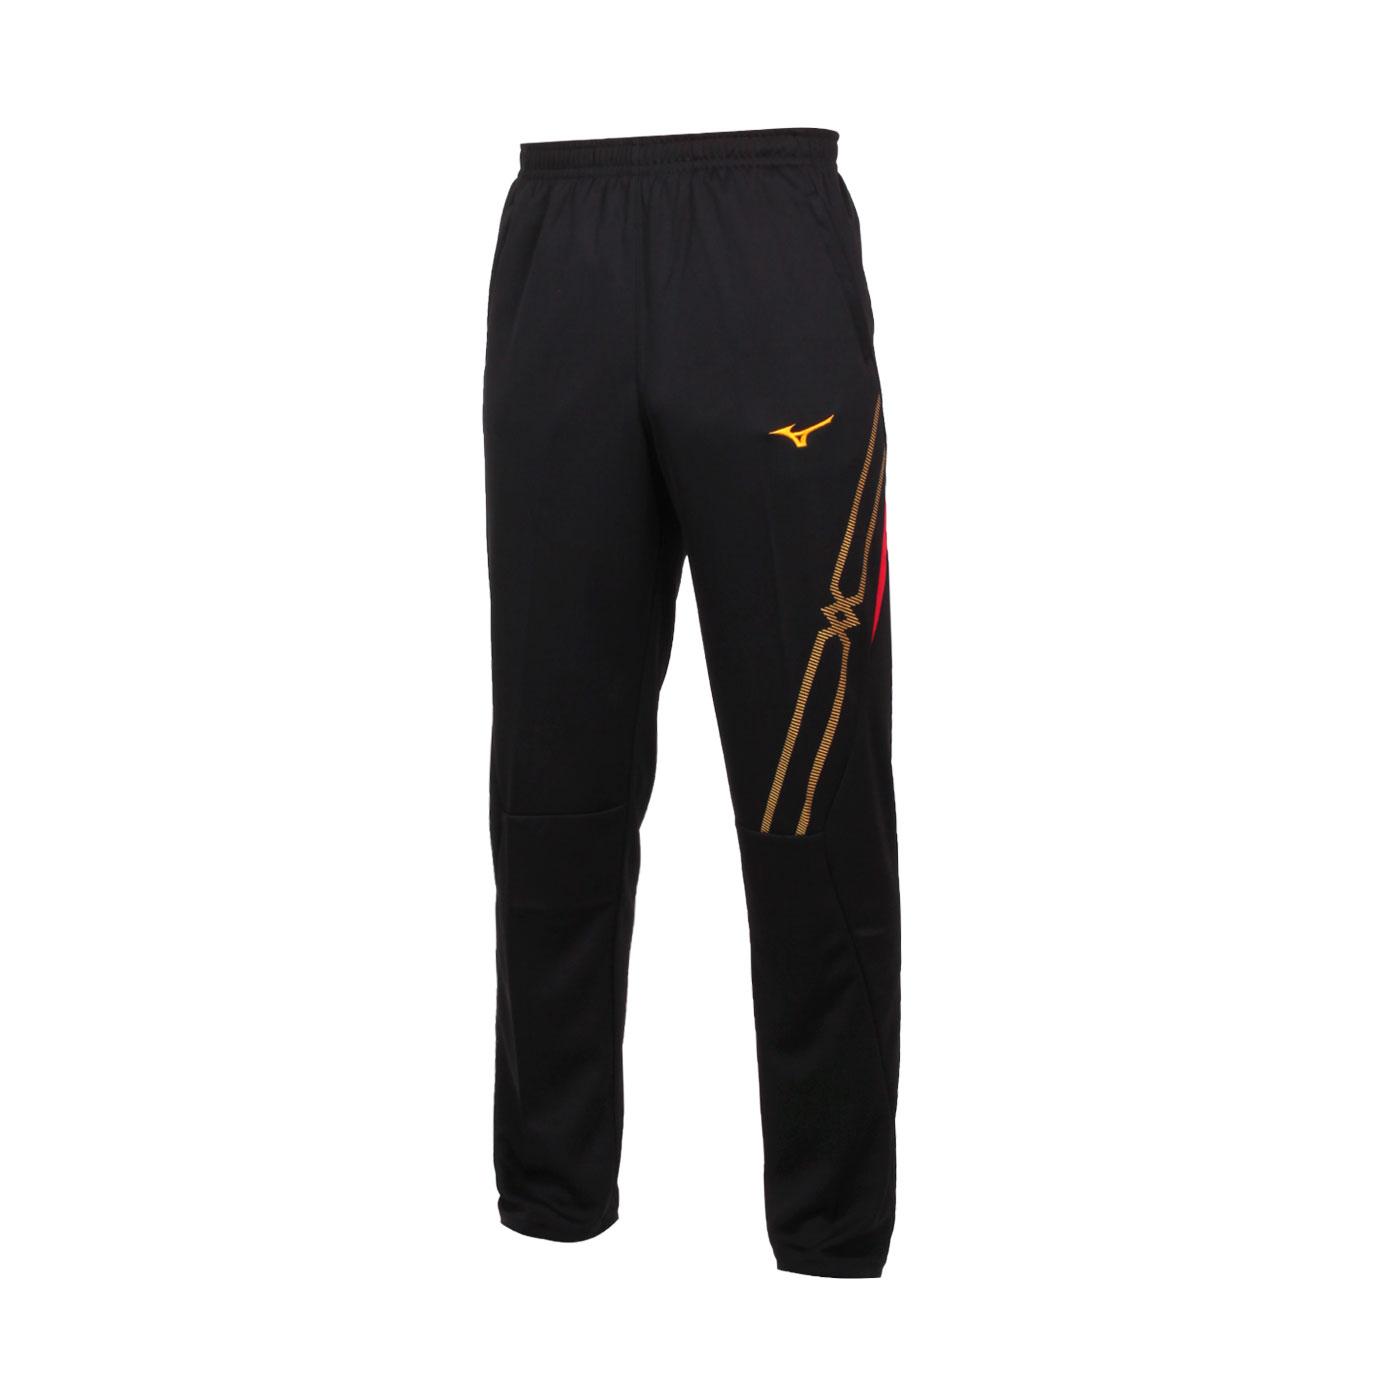 MIZUNO 男款針織長褲 32TD103396 - 黑金紅